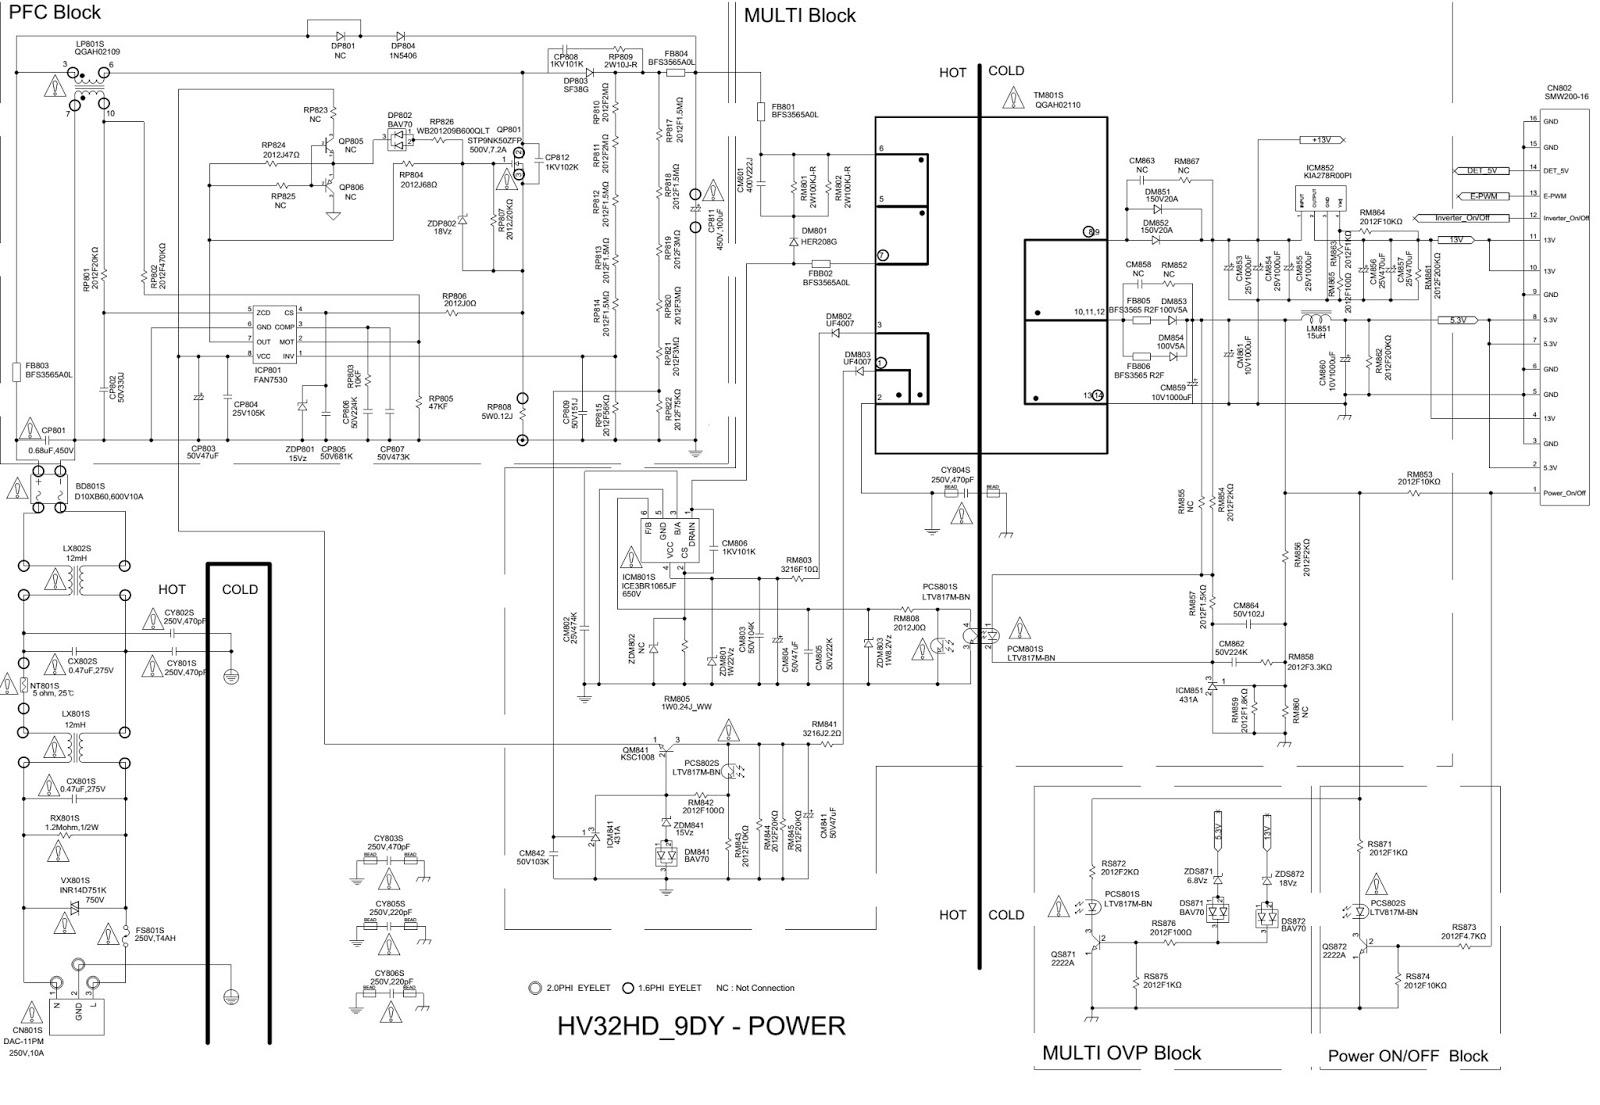 sky tv wiring diagram fleetwood pioneer travel trailer samsung plasma get free image about